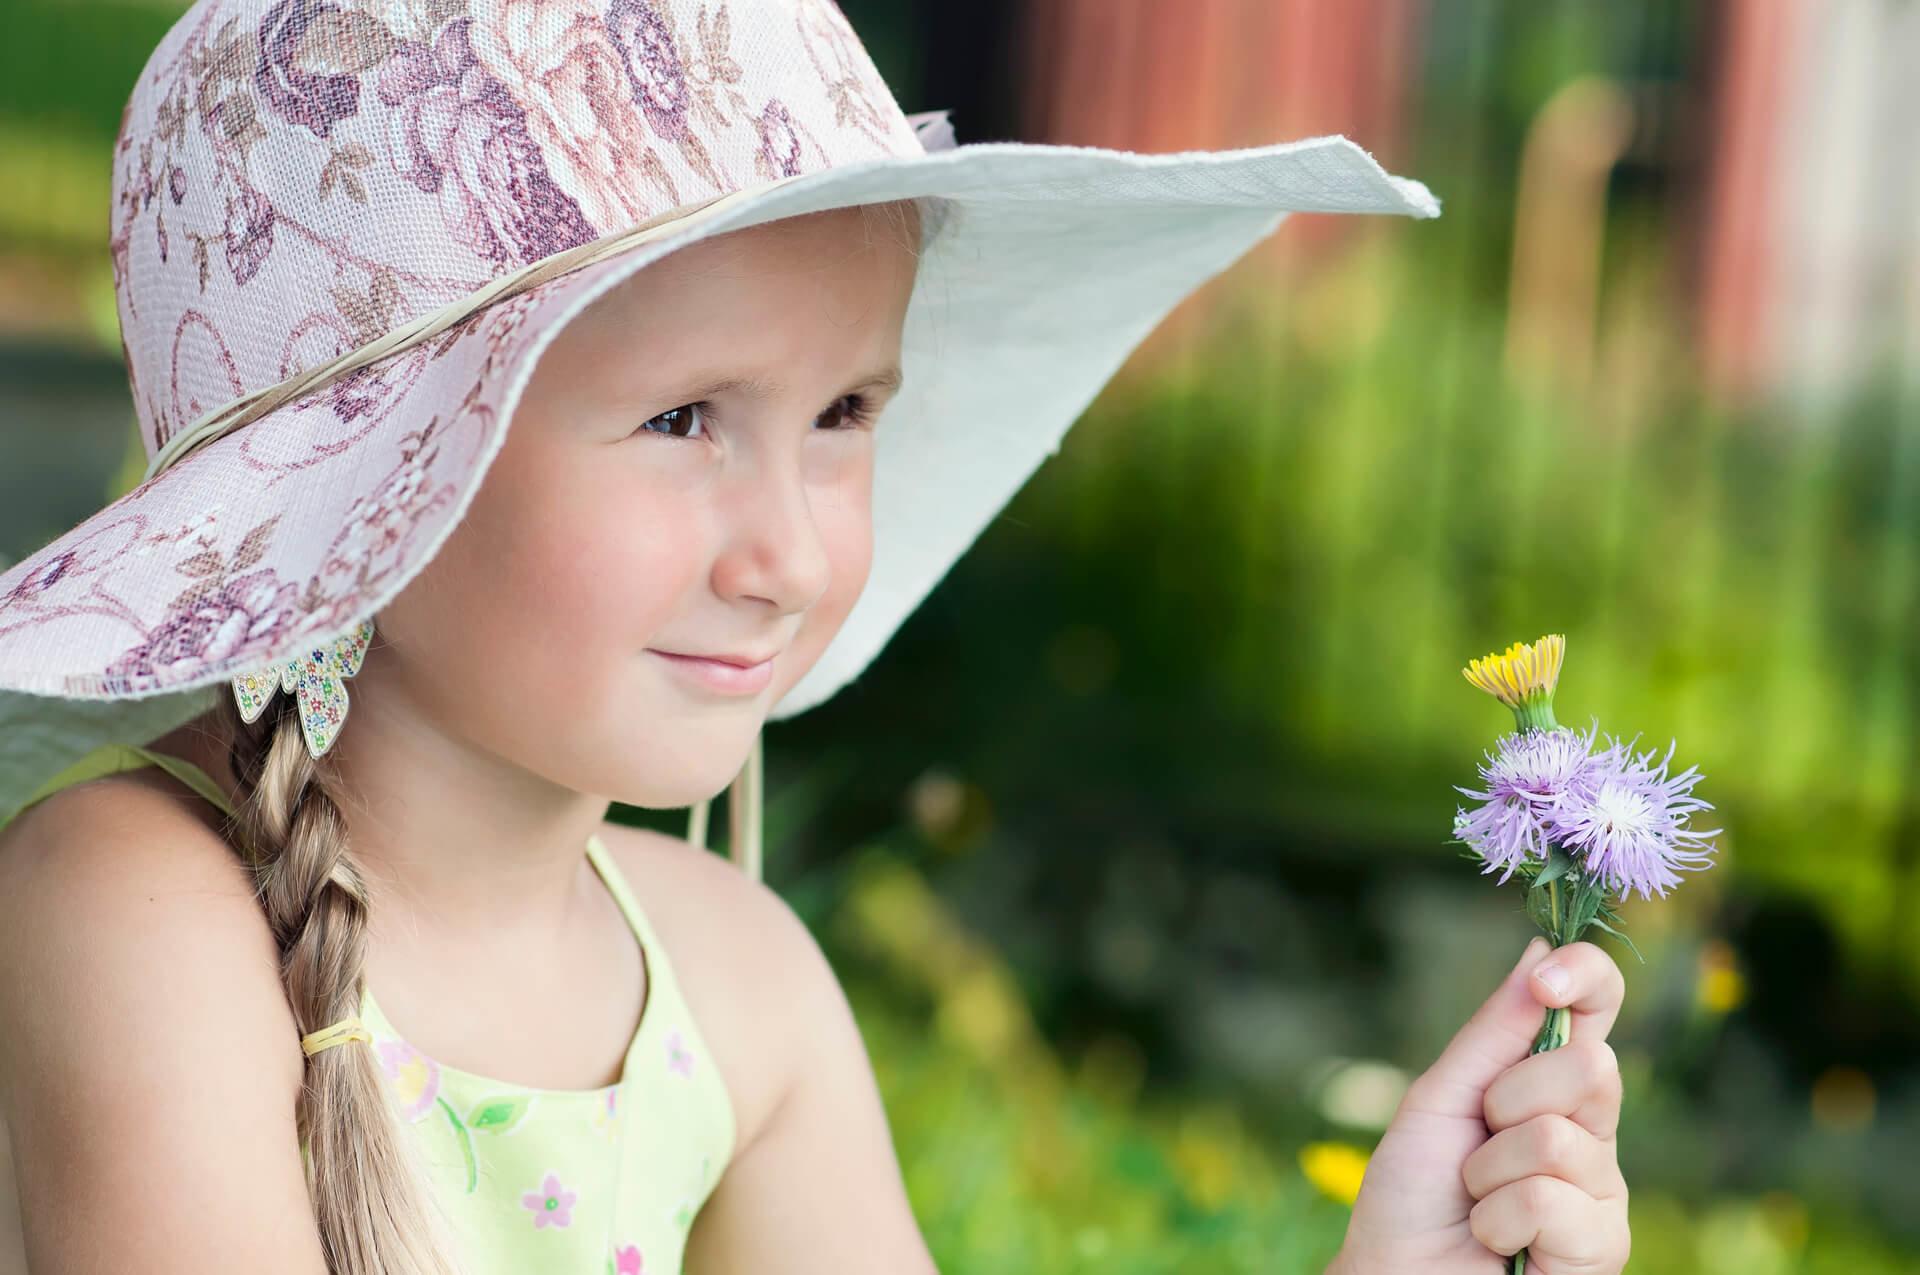 profesionalny fotograf Peter Norulak Kosice umelecke fotky deti exterier_24